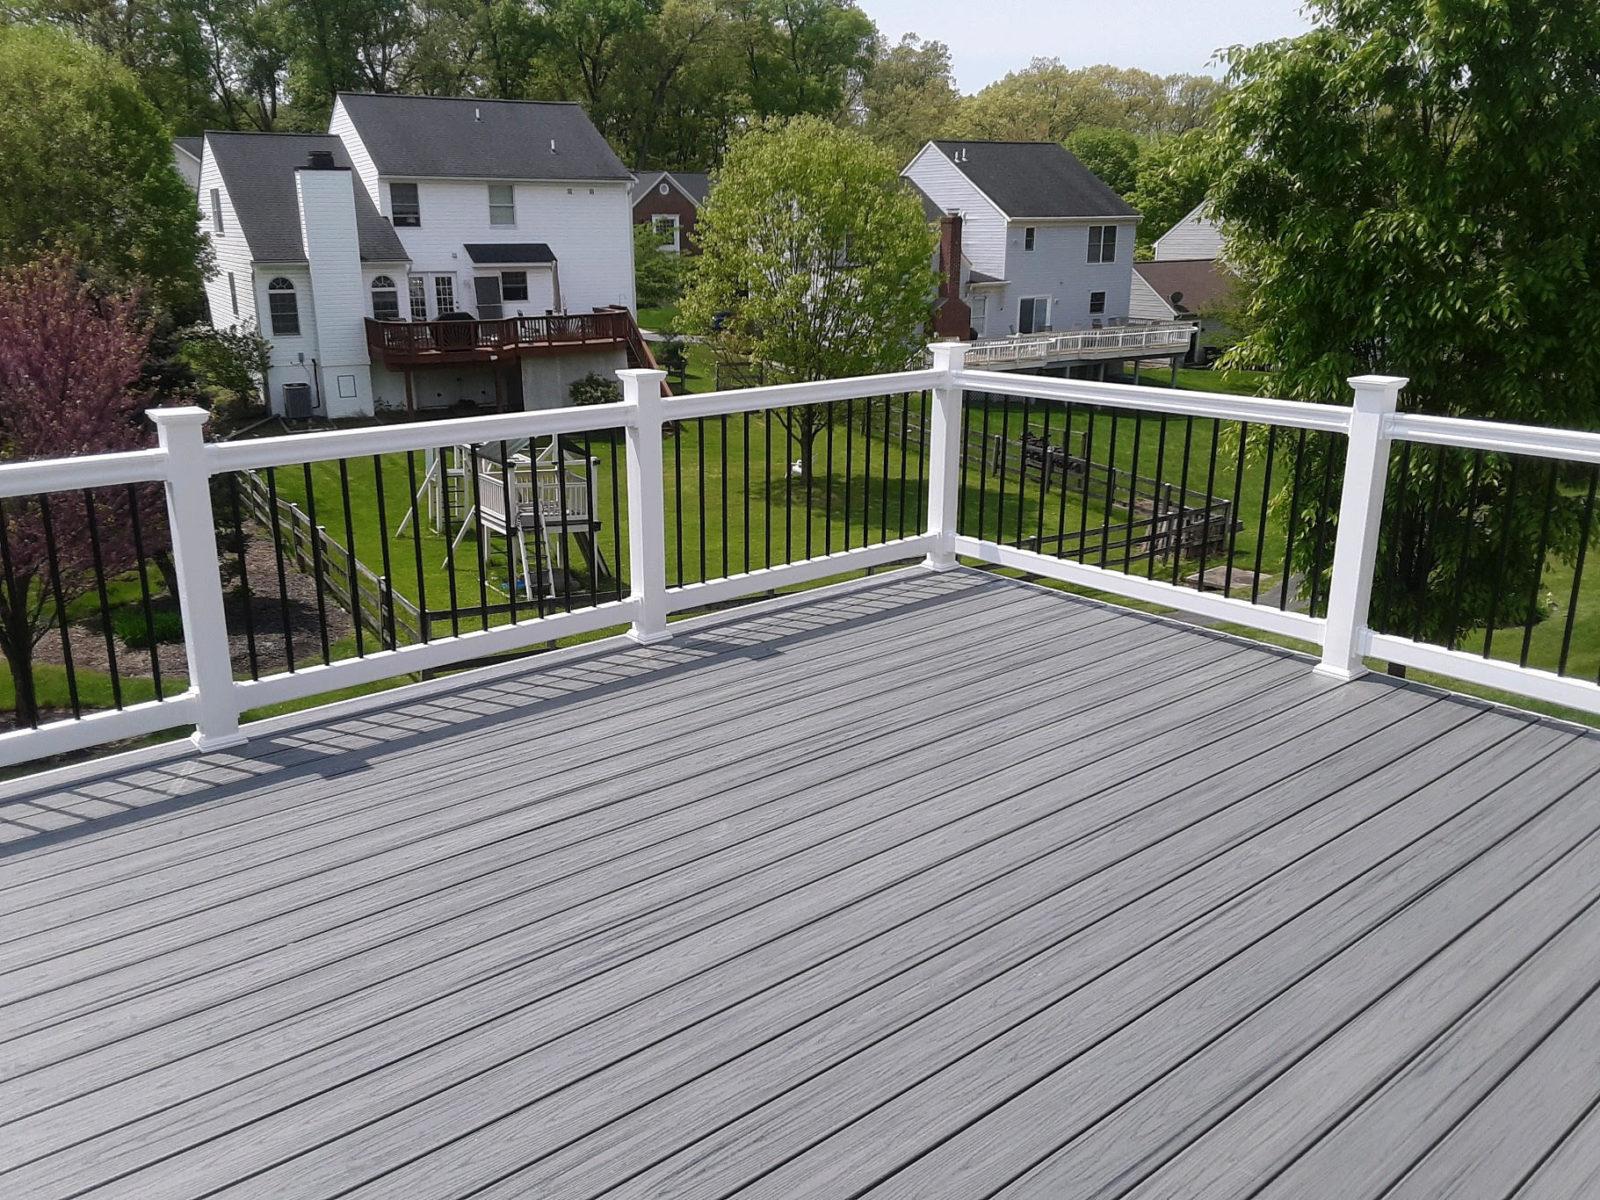 High-Quality Decks in Jefferson, Maryland